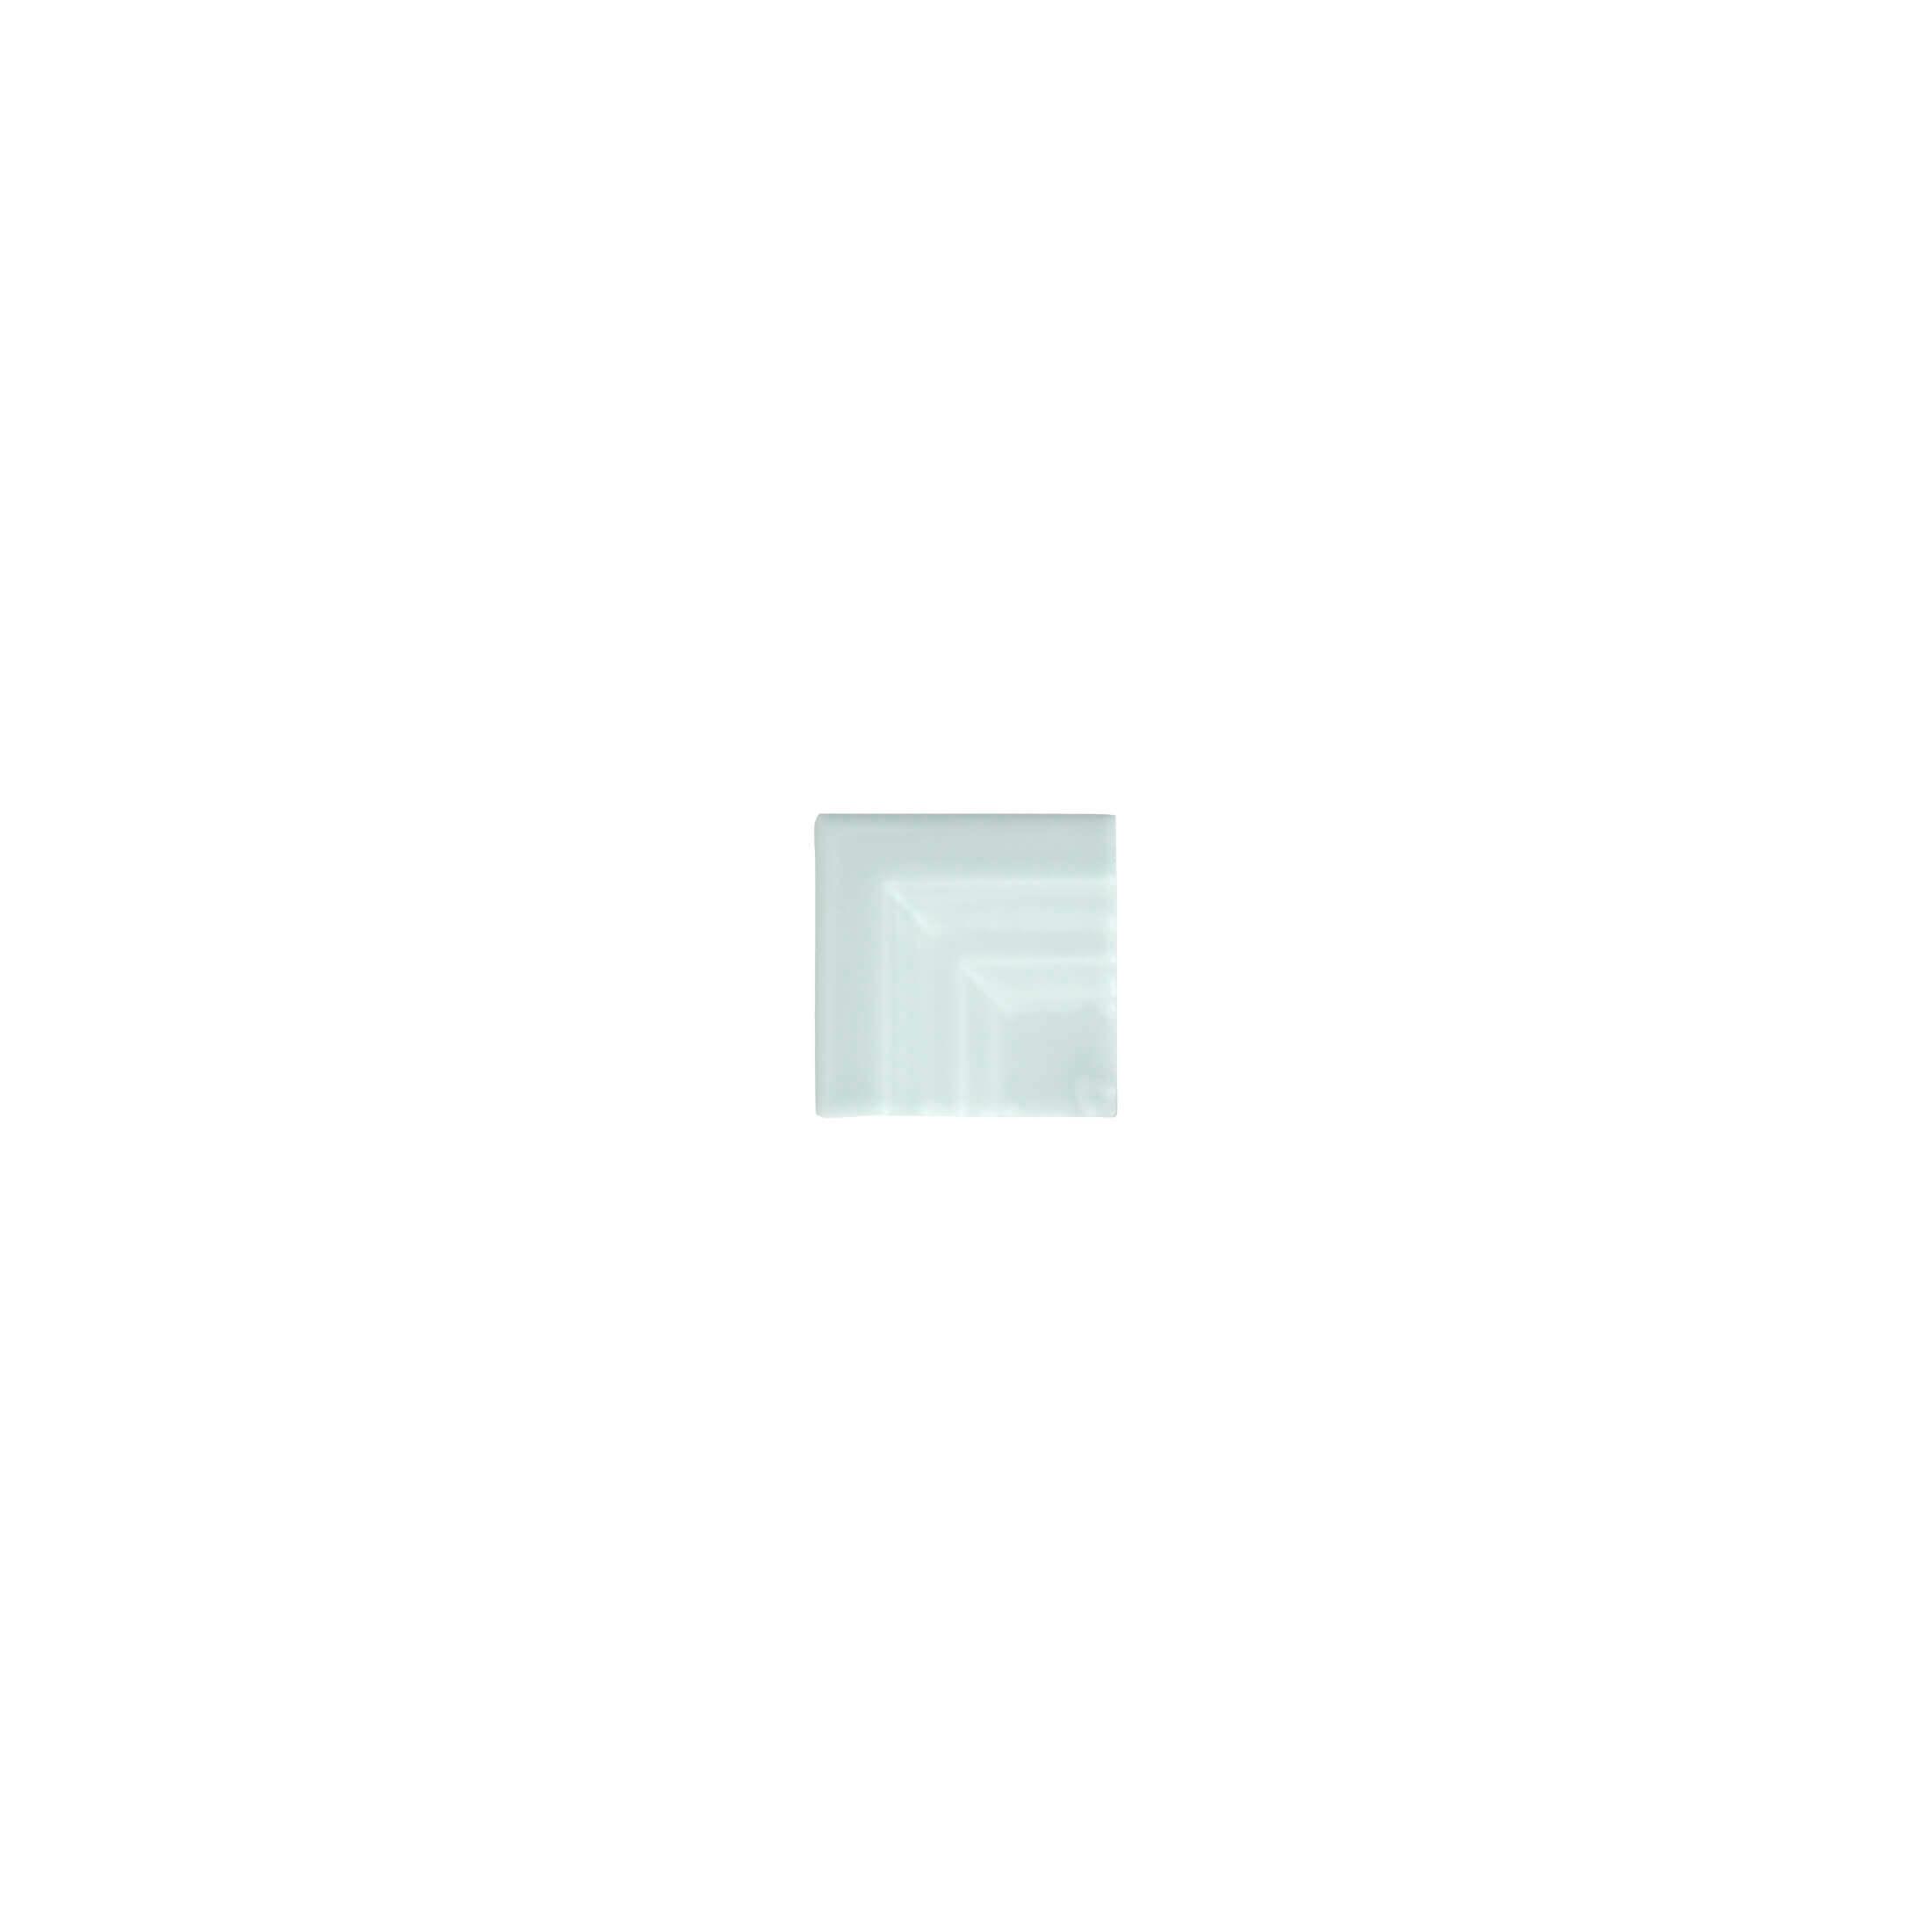 ADST5260 - ANGULO MARCO CORNISA - 5 cm X 19.8 cm